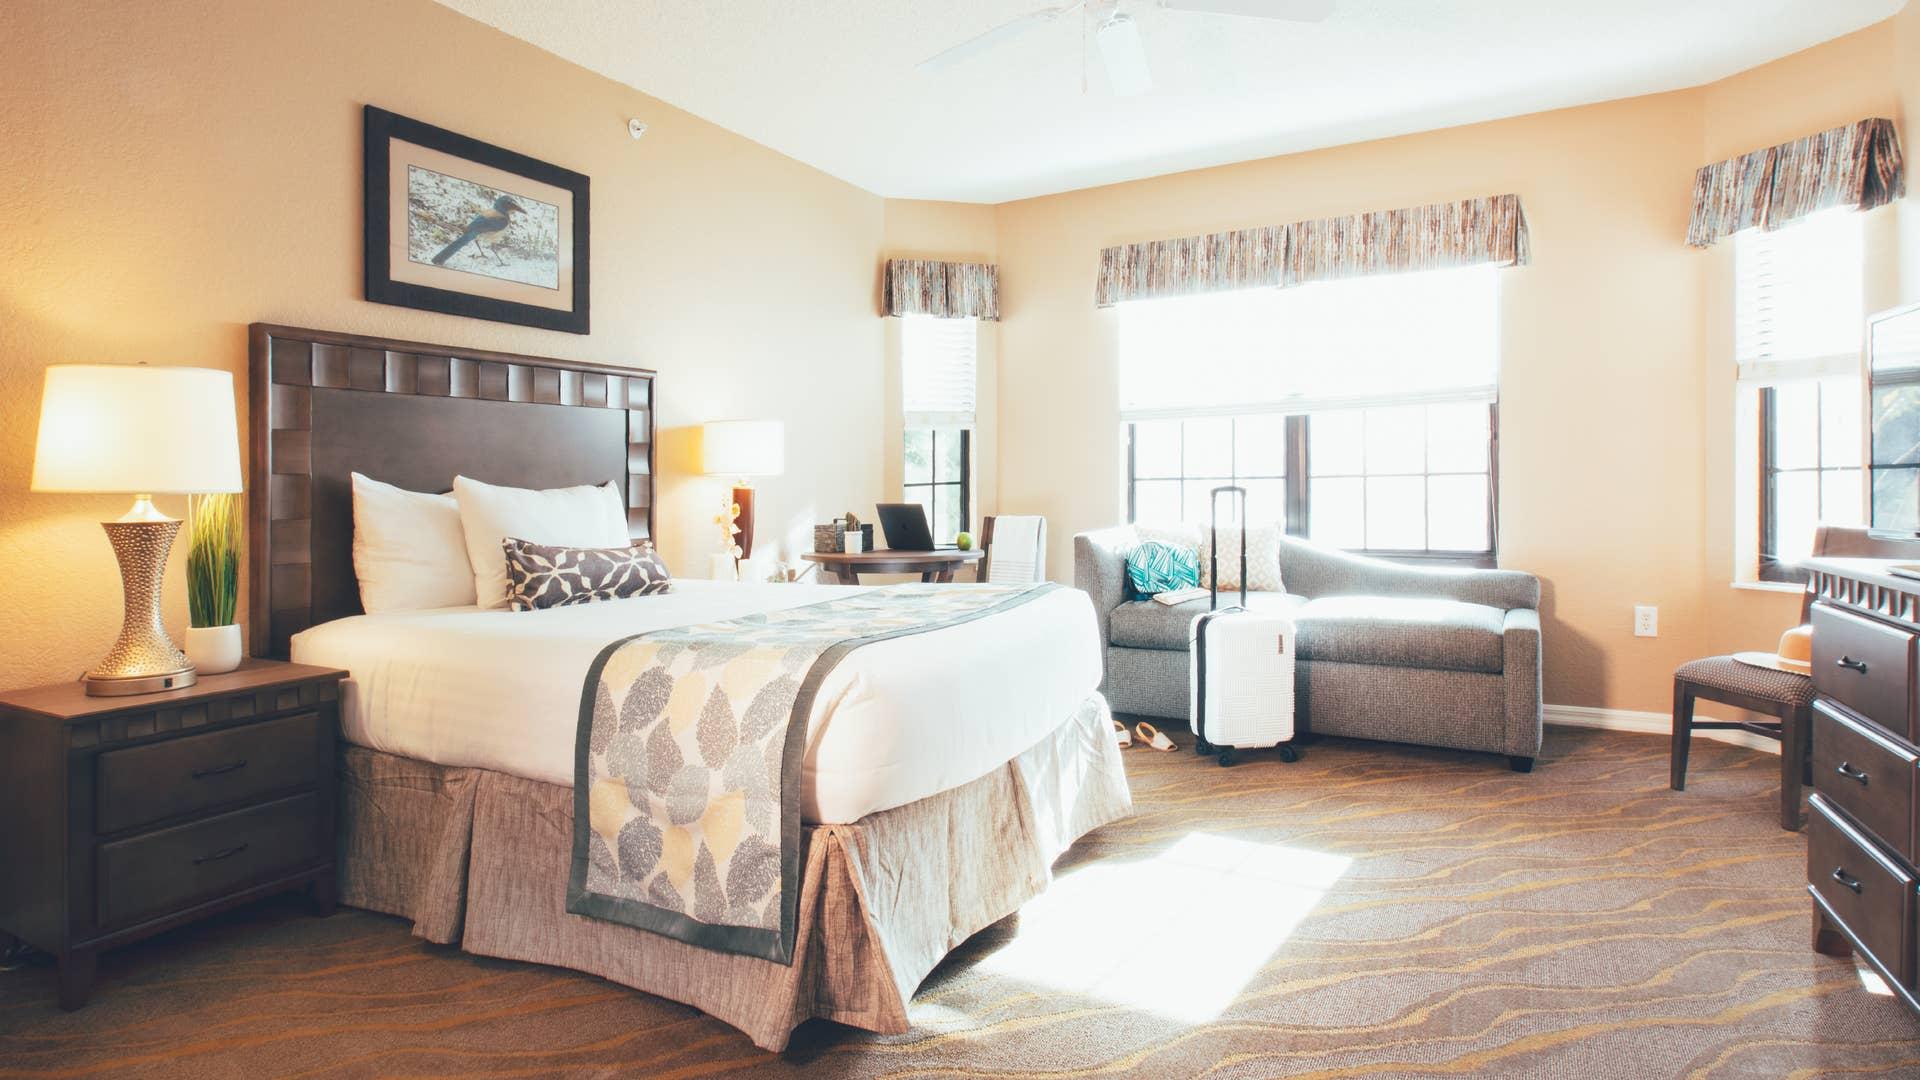 Orange Lake Resort Pictures At West Village Three Bedroom Villa Holidayinnclub Com